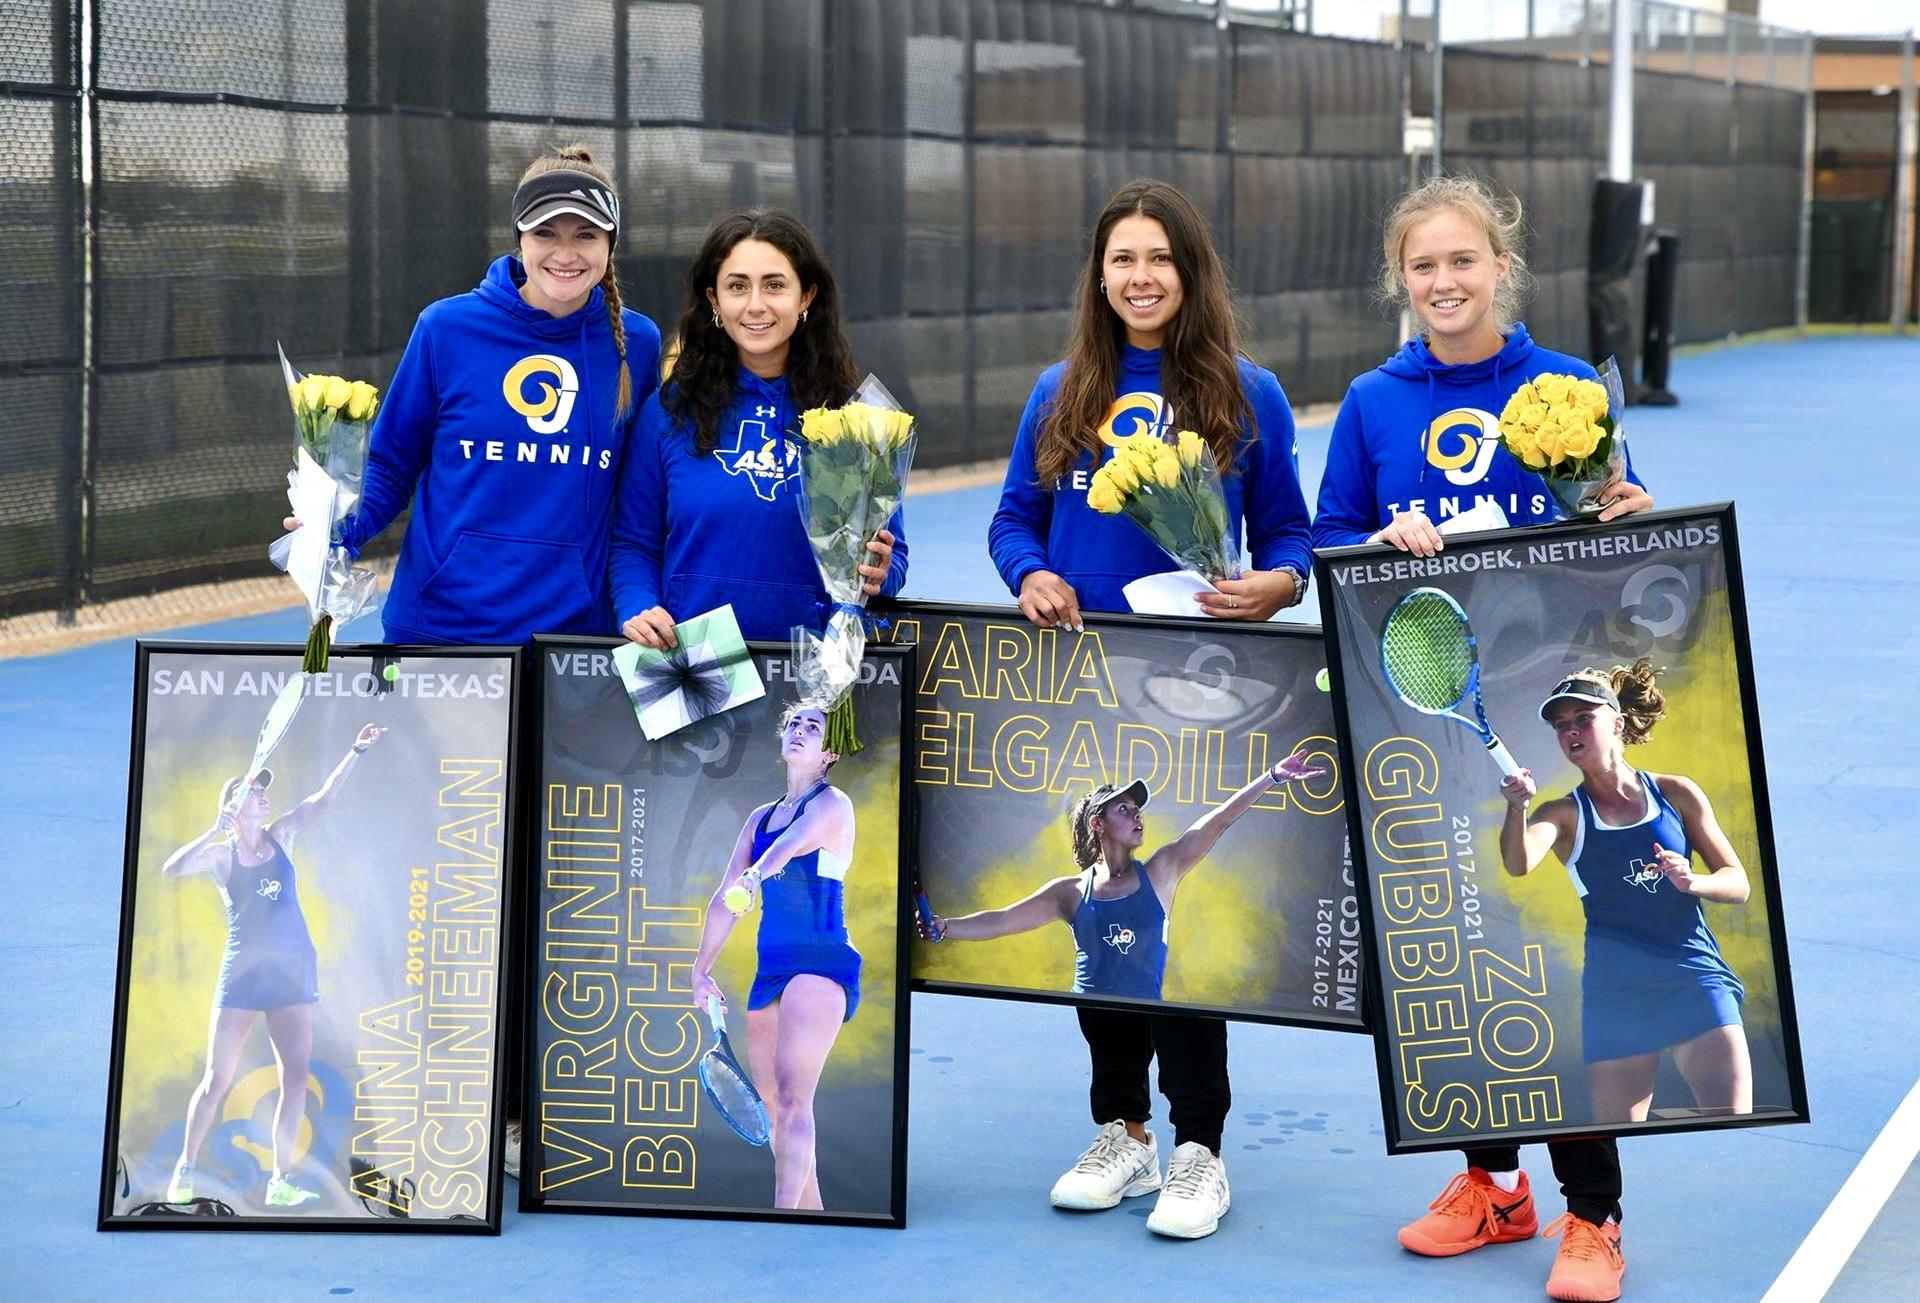 Senior Day - College Tennis USA